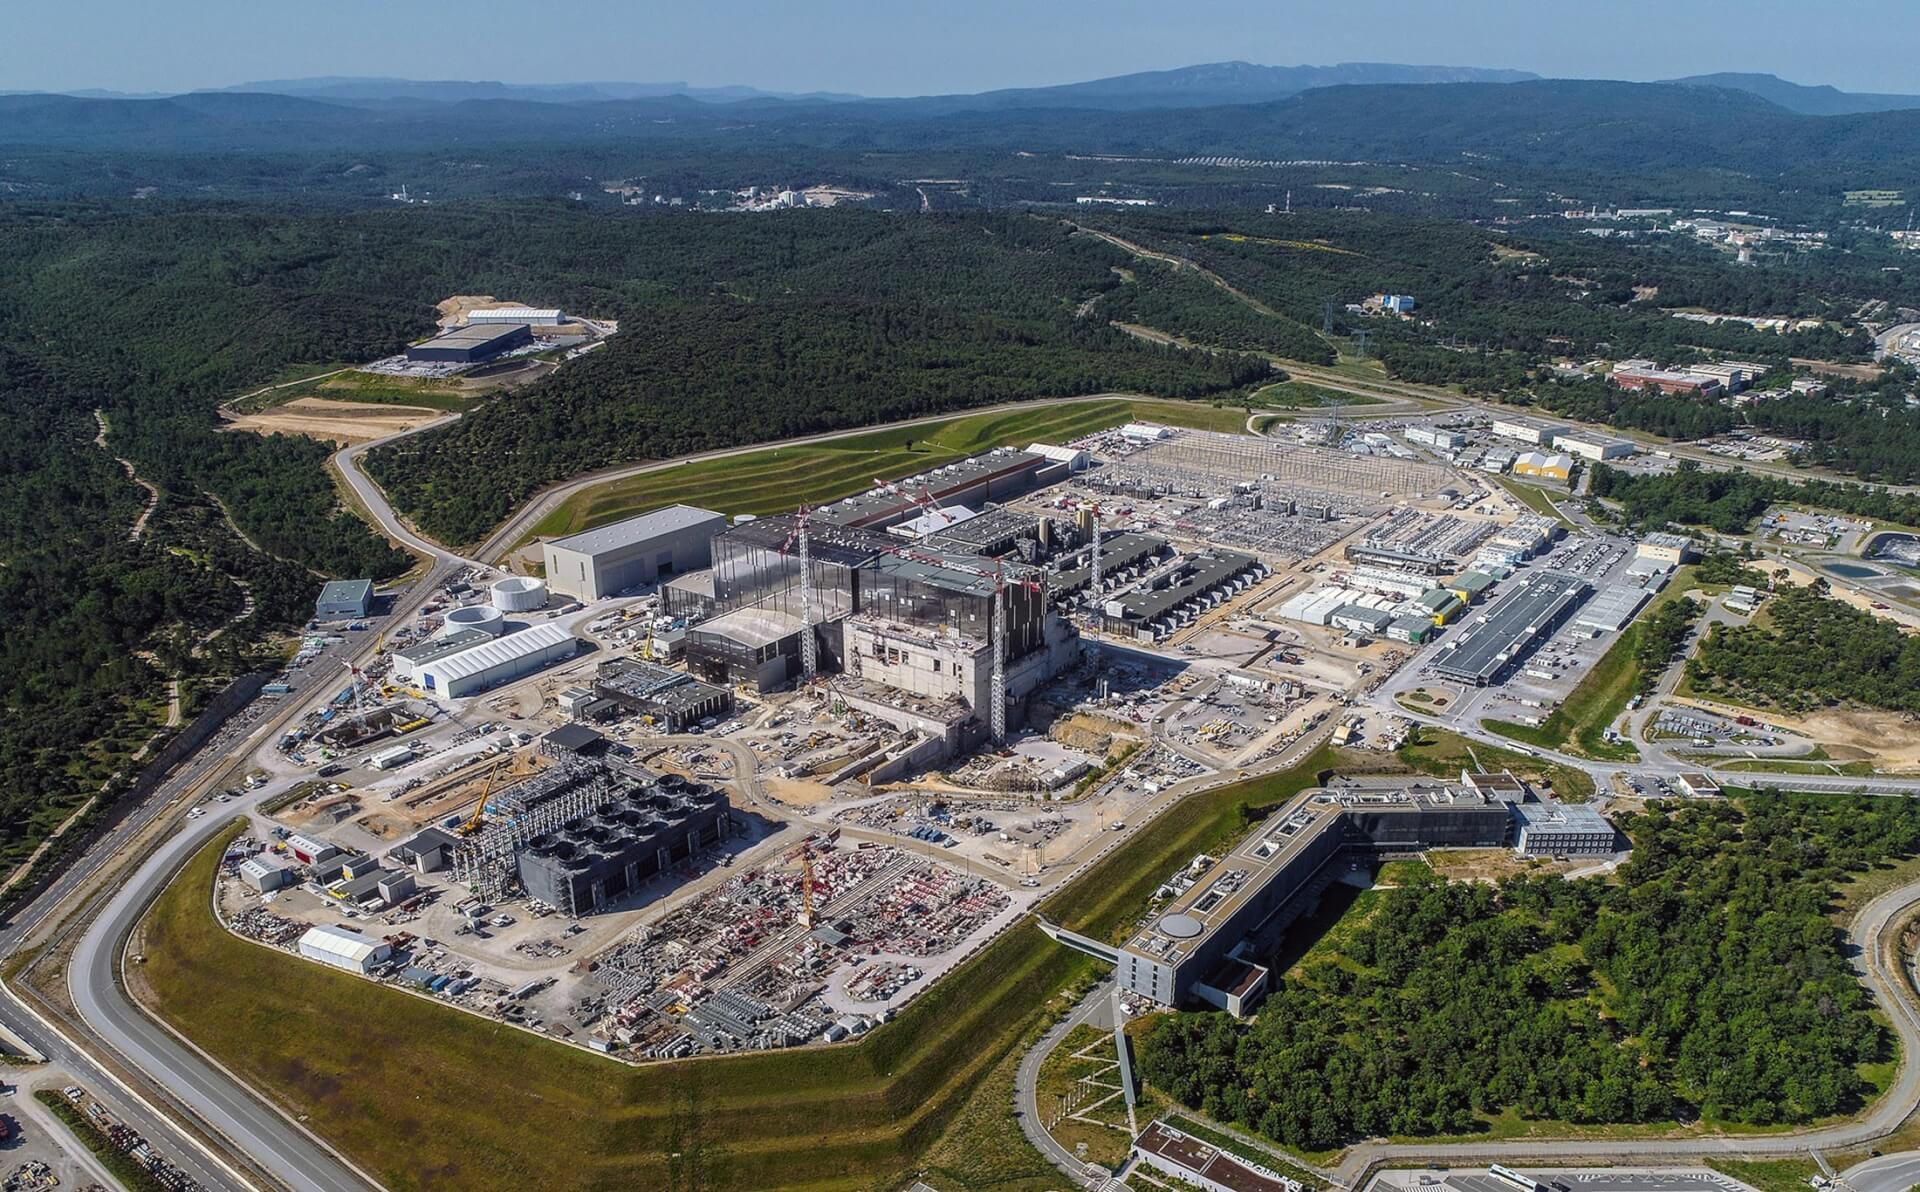 foto č. 3 ITER platform may 2020 riche ed small